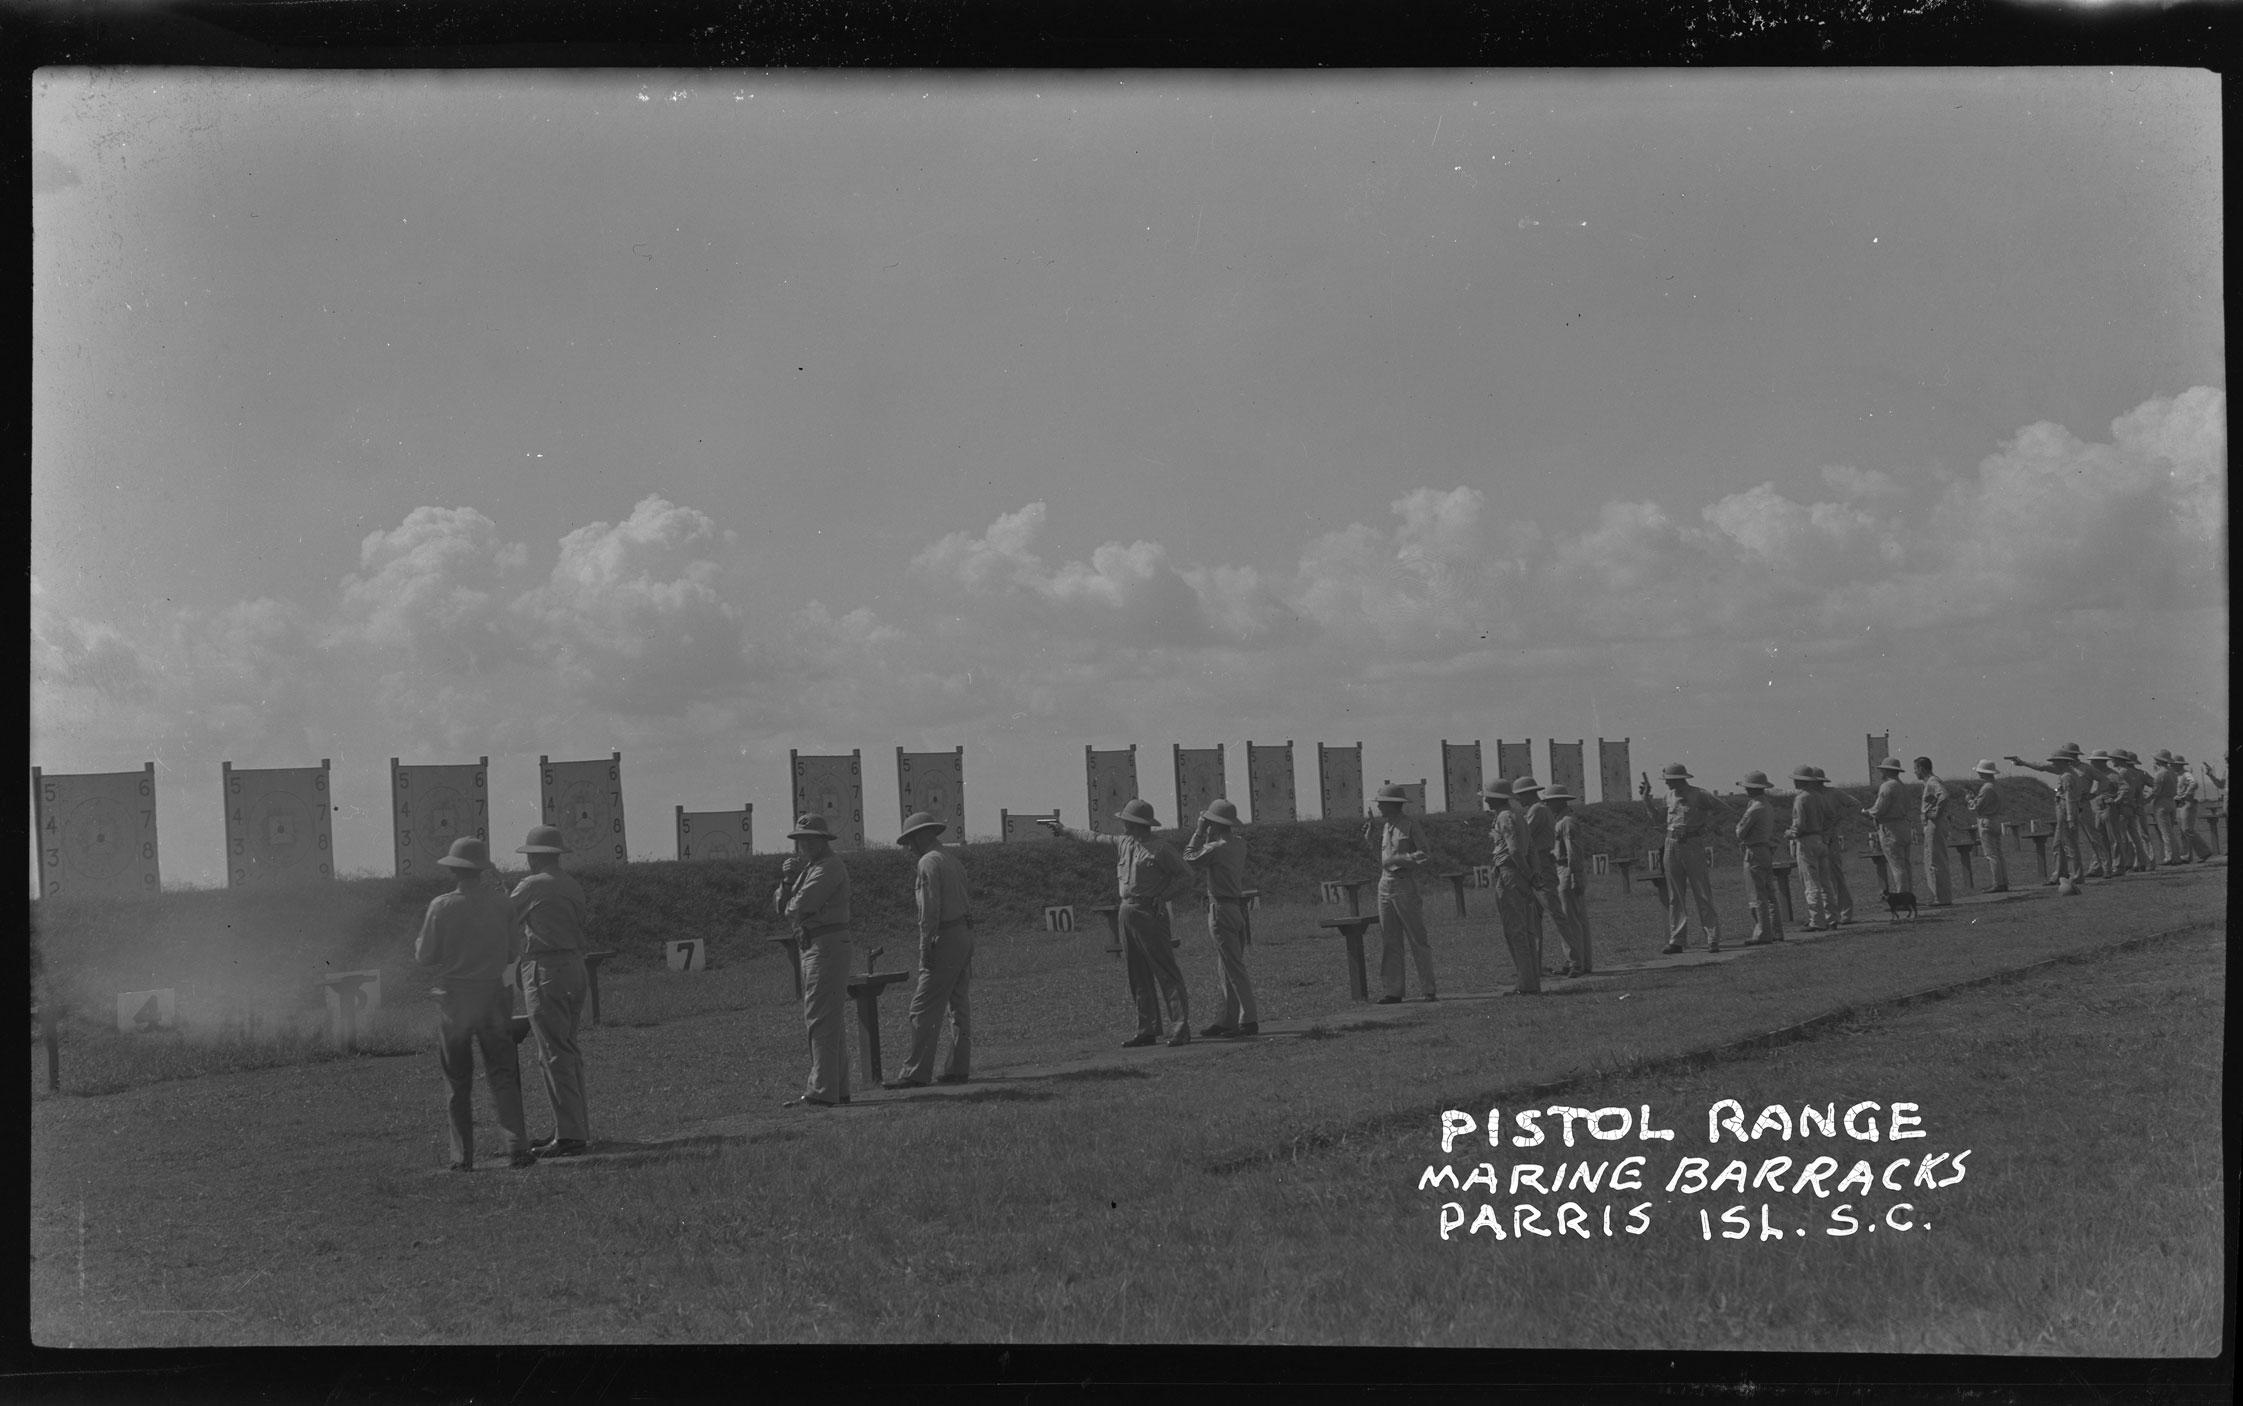 Pistol Range Marine Barracks Parris Isl. S.C. Rifle Range (Pistol Range)